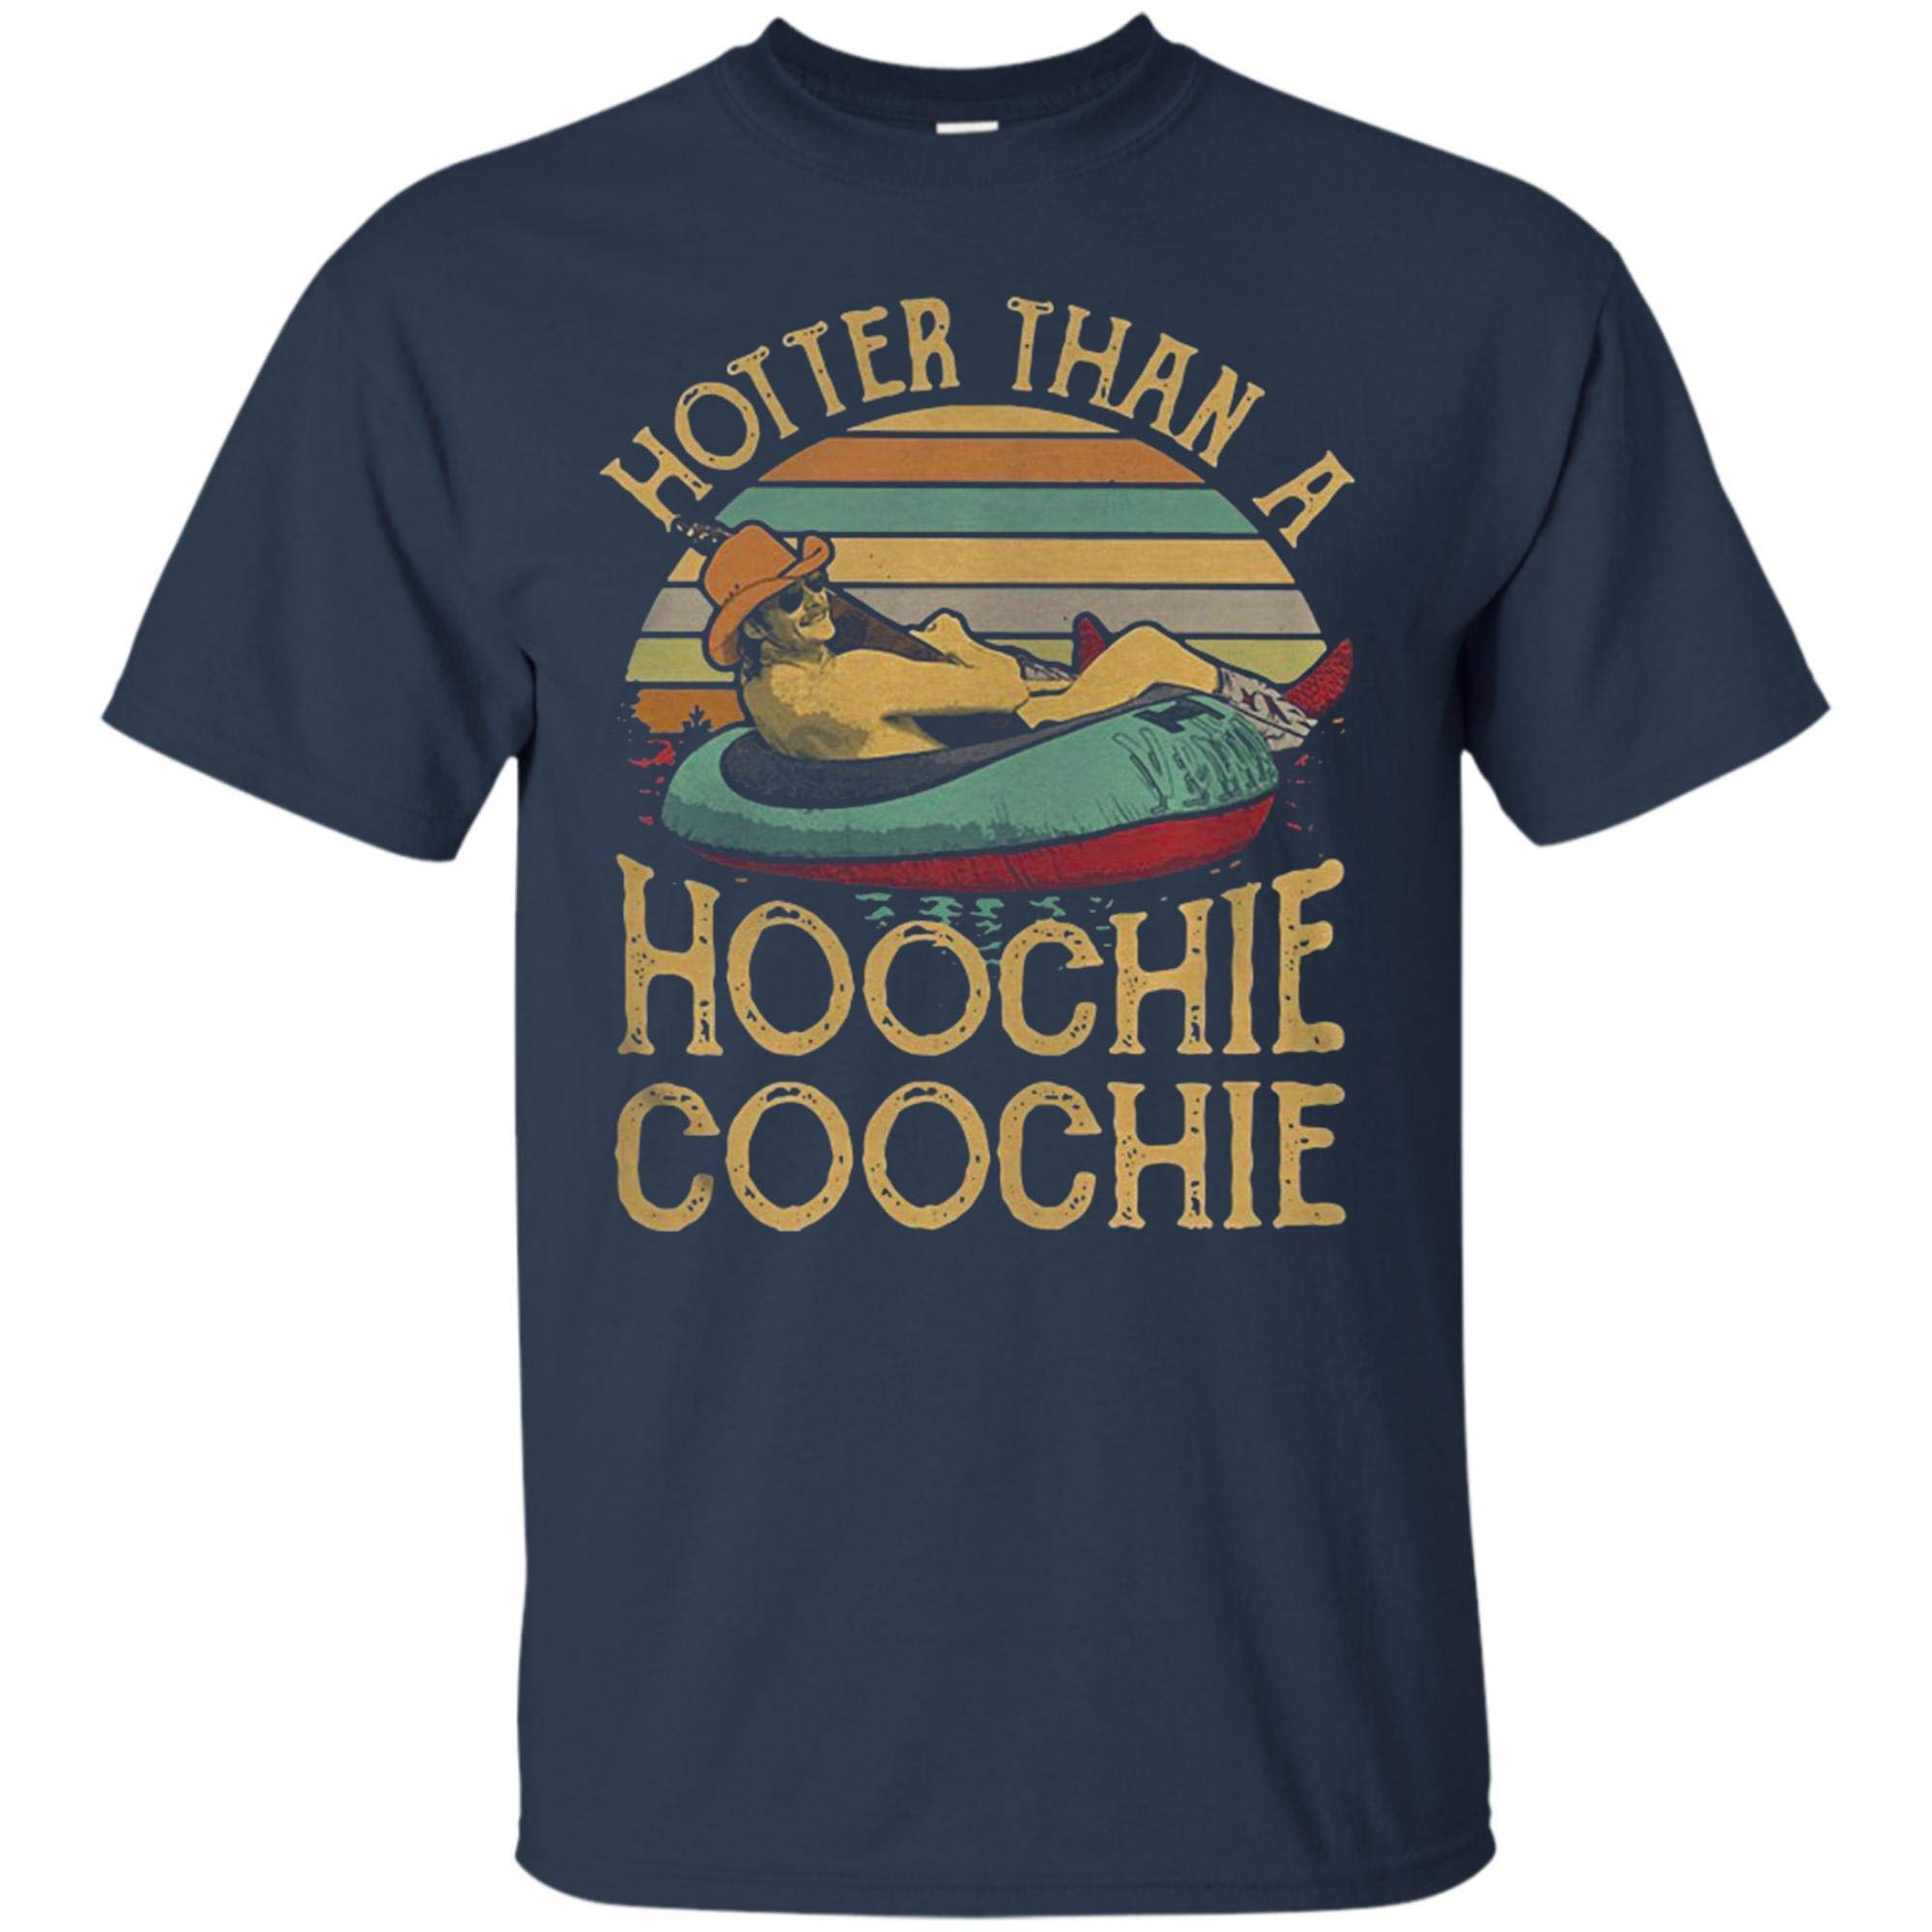 Hotter Than A Hoochie Coochie Funny Tshirt